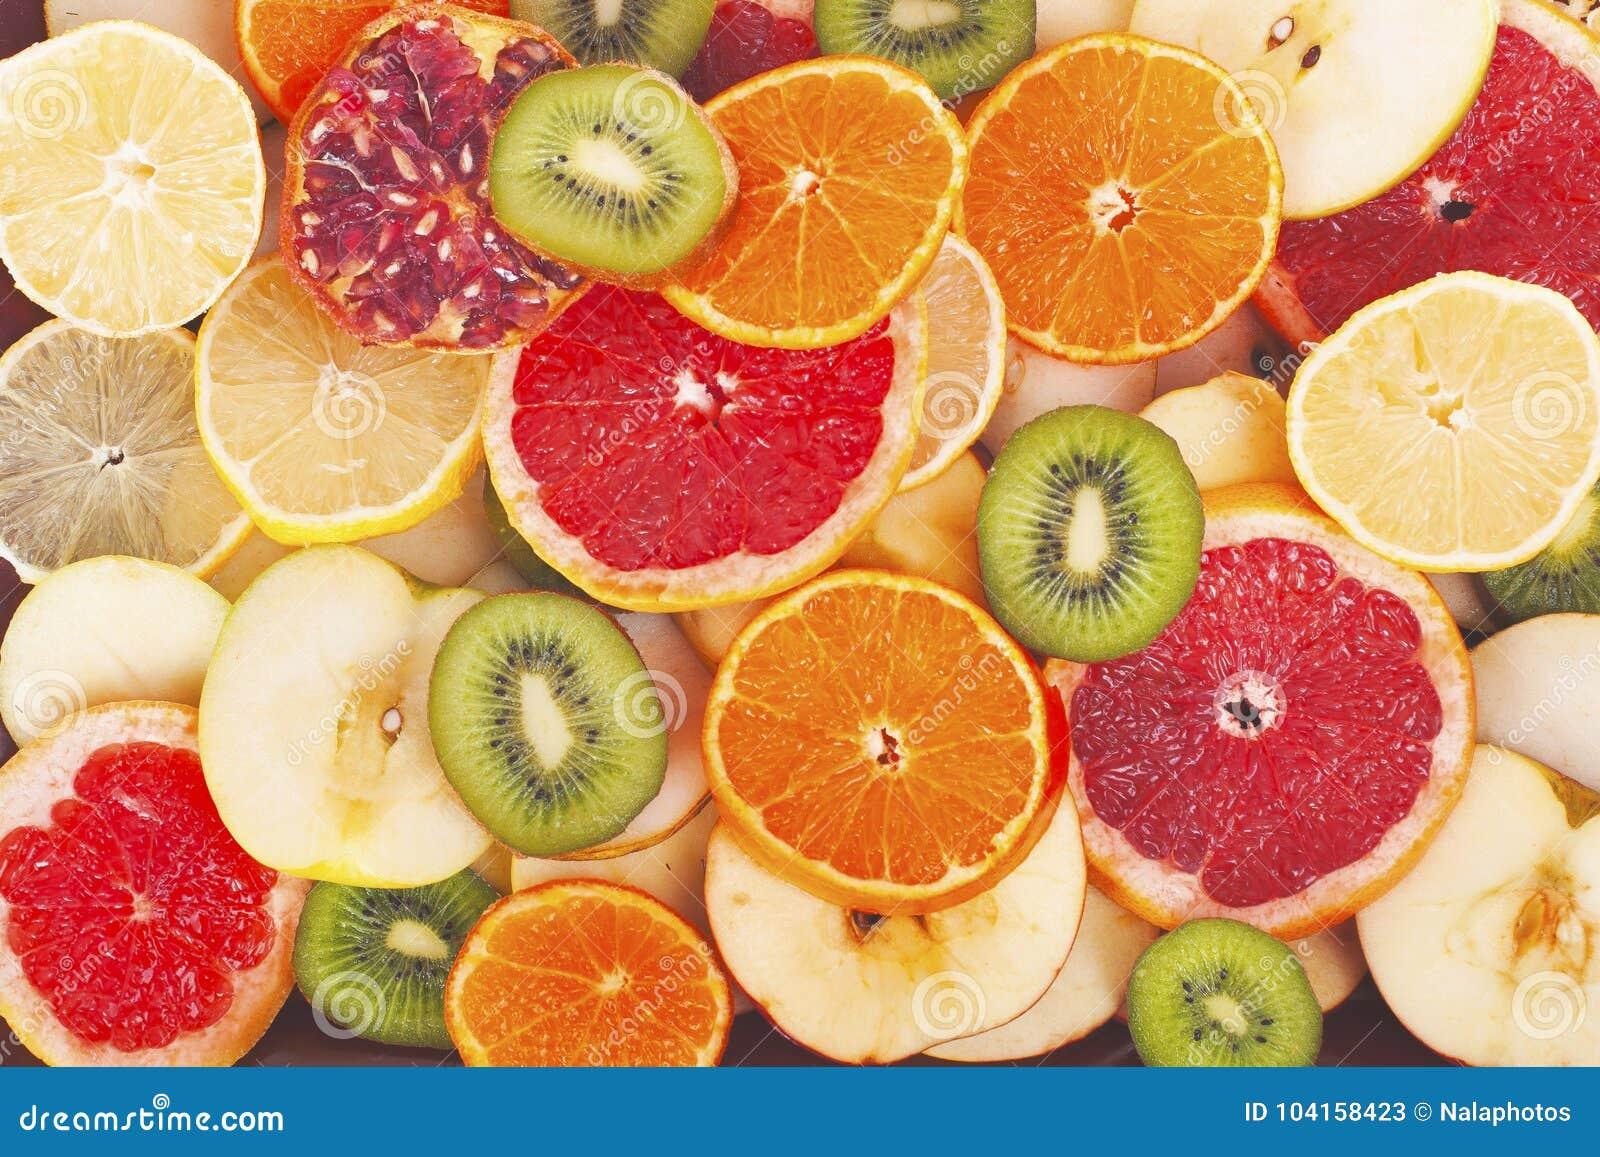 fruit textures kiwi orange grapefruit lemon apple pear pomegranate